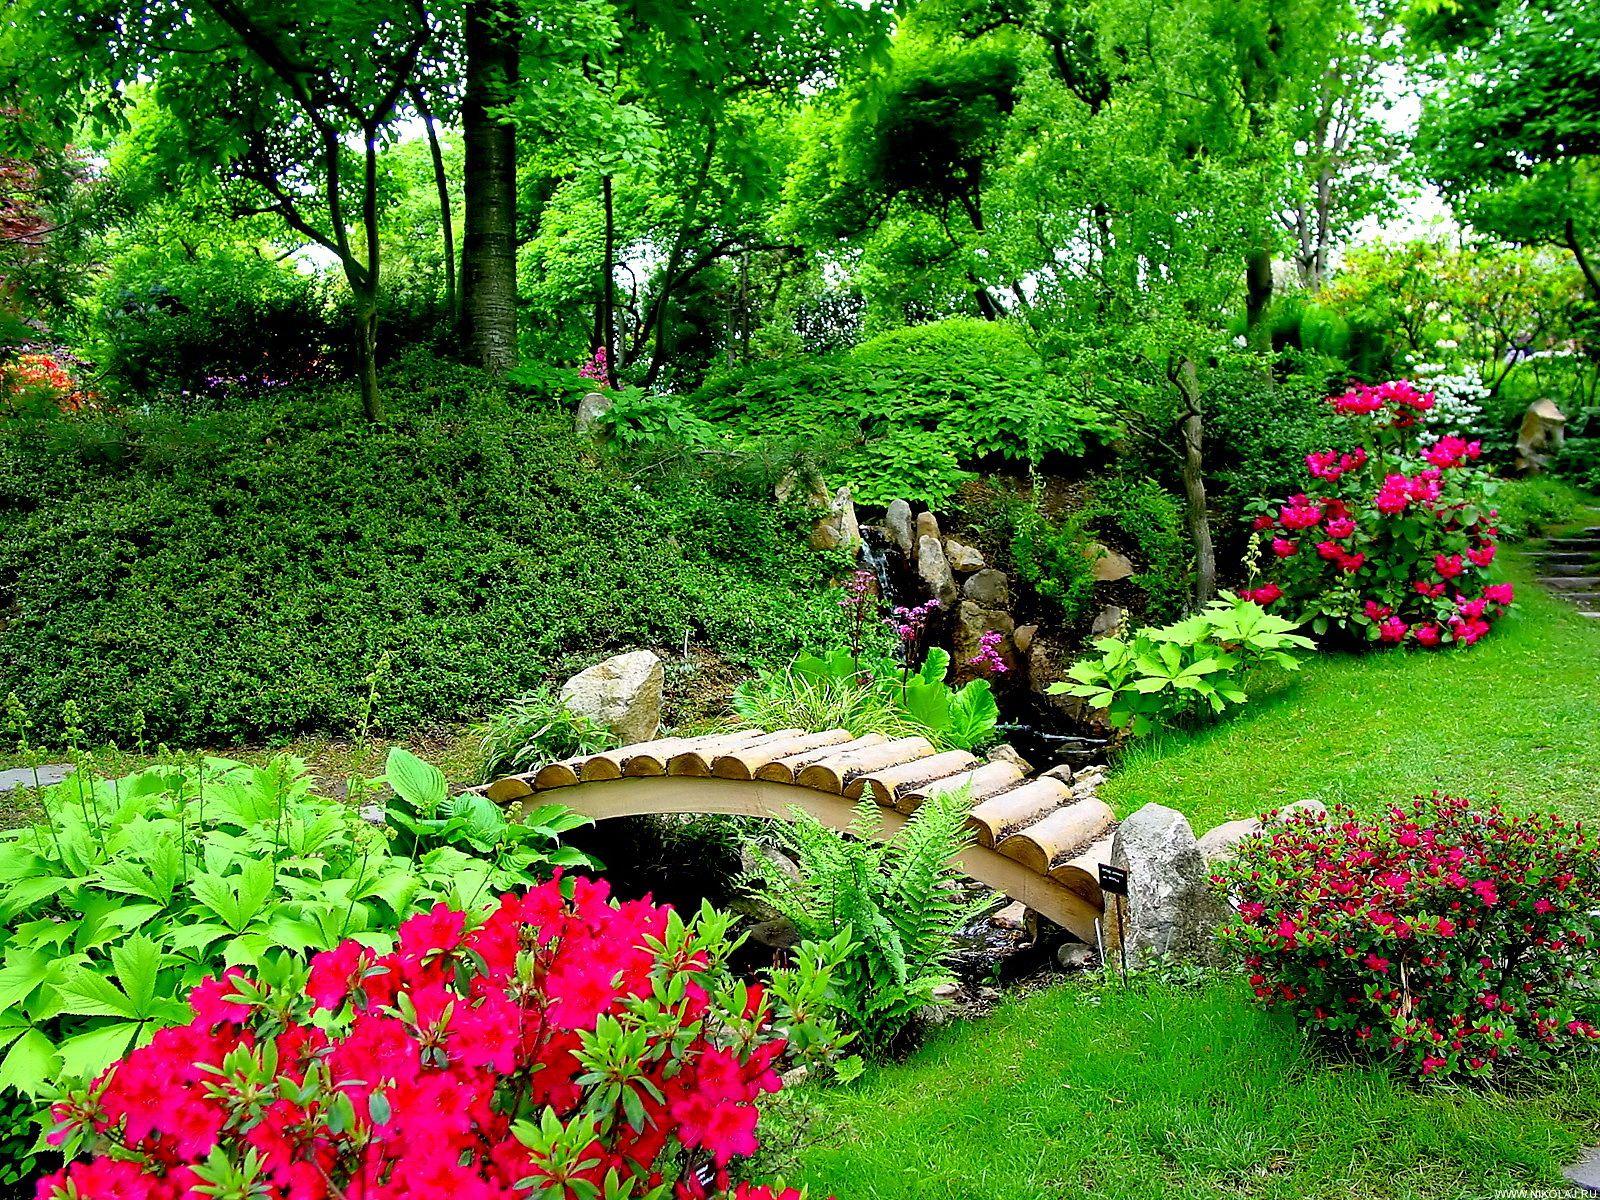 Beautiful Nature Flowers Garden Widescreen 2 HD Wallpapers